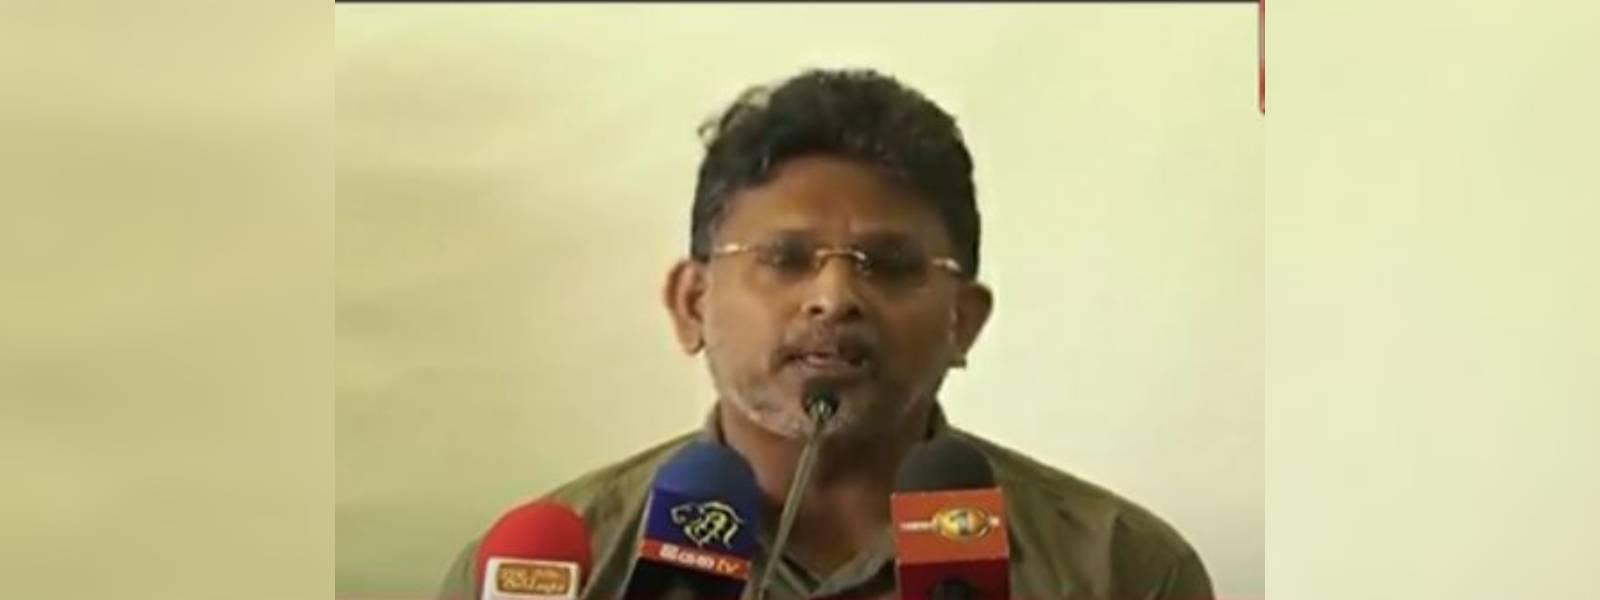 Outcry on providing shotguns to farmers